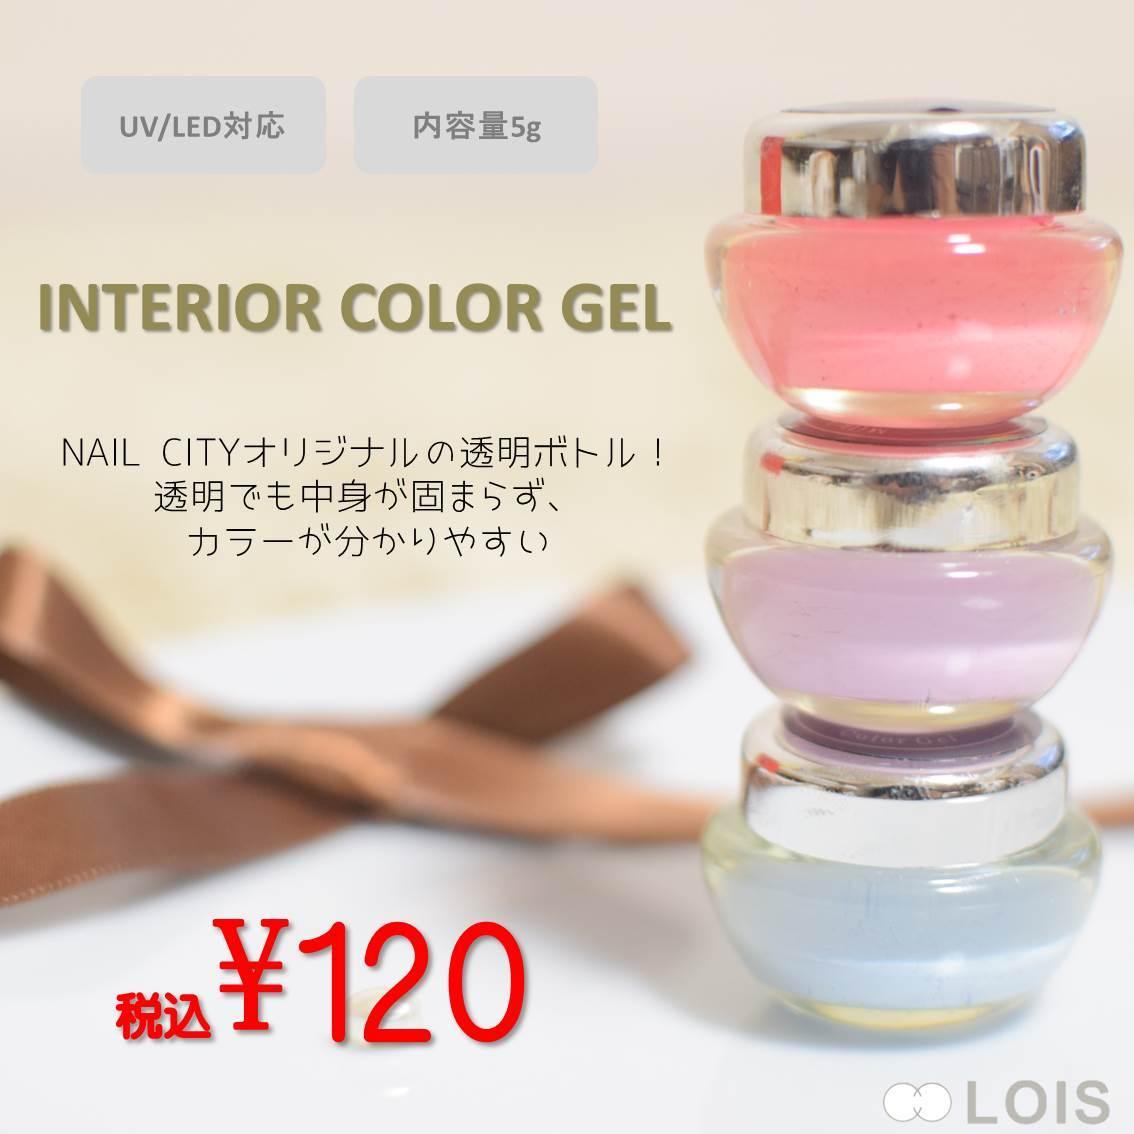 Qoo10インテリアカラージェル 001-101 ネイル ジェルネイル カラージェル プチプラ LED対応 UV対応 アウトレット 訳あり